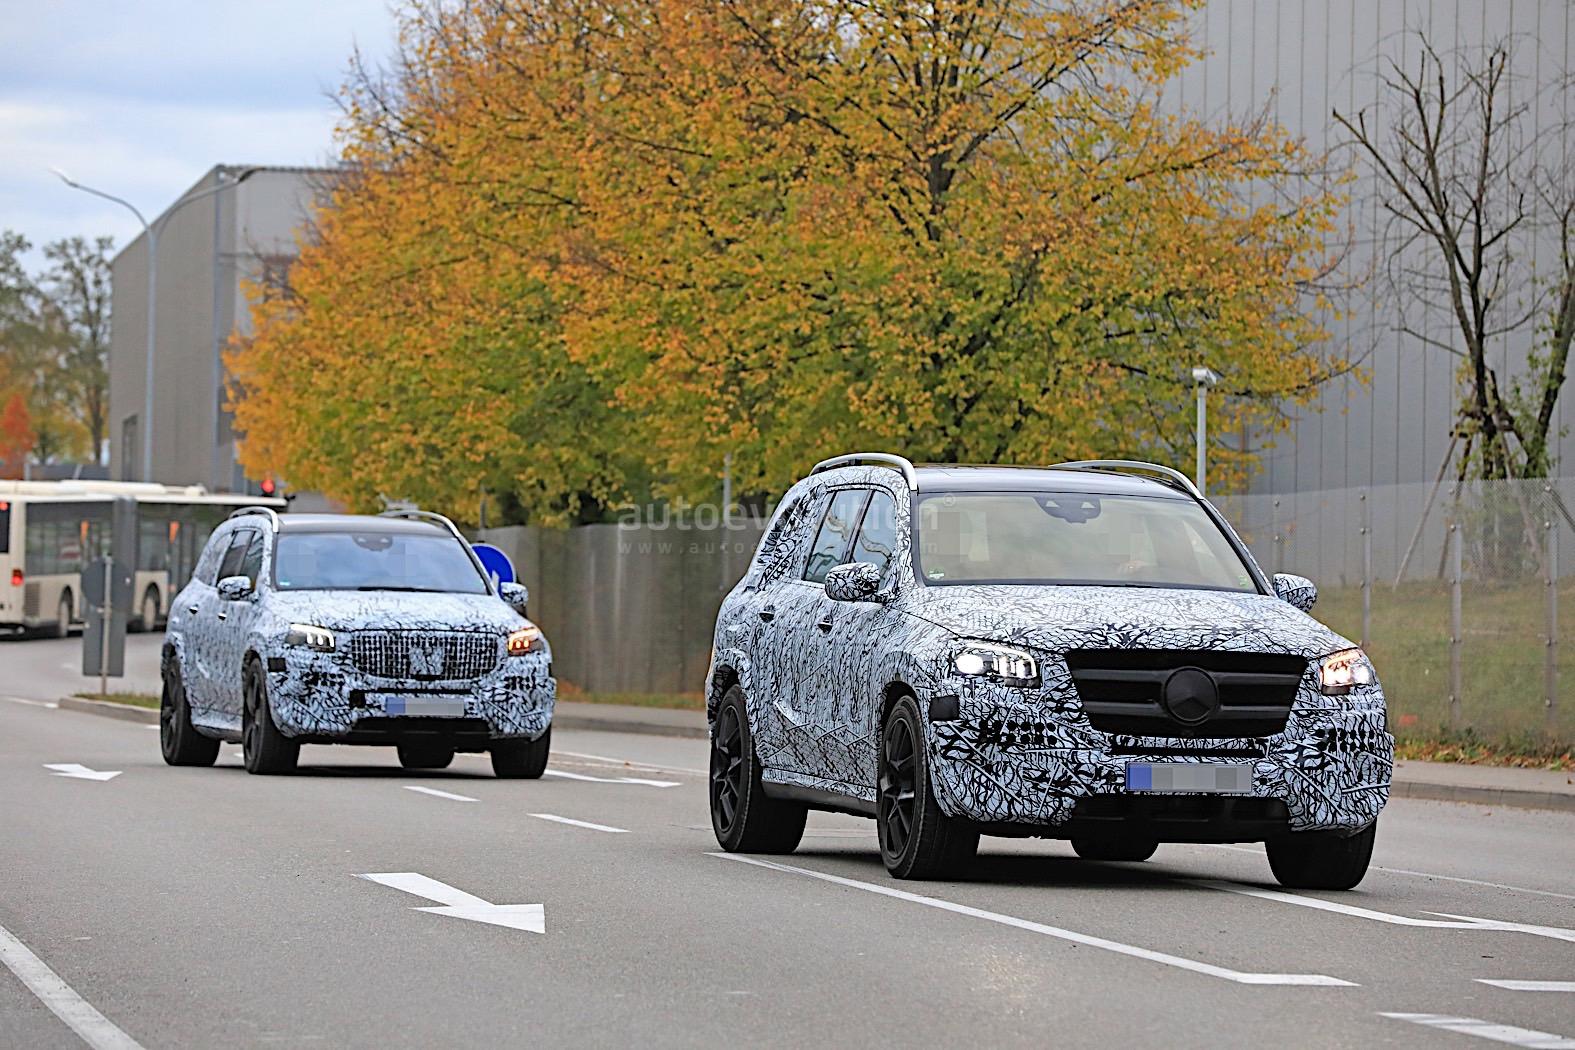 ac60e9f2c10 2020 Mercedes-Maybach GLS Meets Mercedes-Benz GLS in Rare Spyshots ...